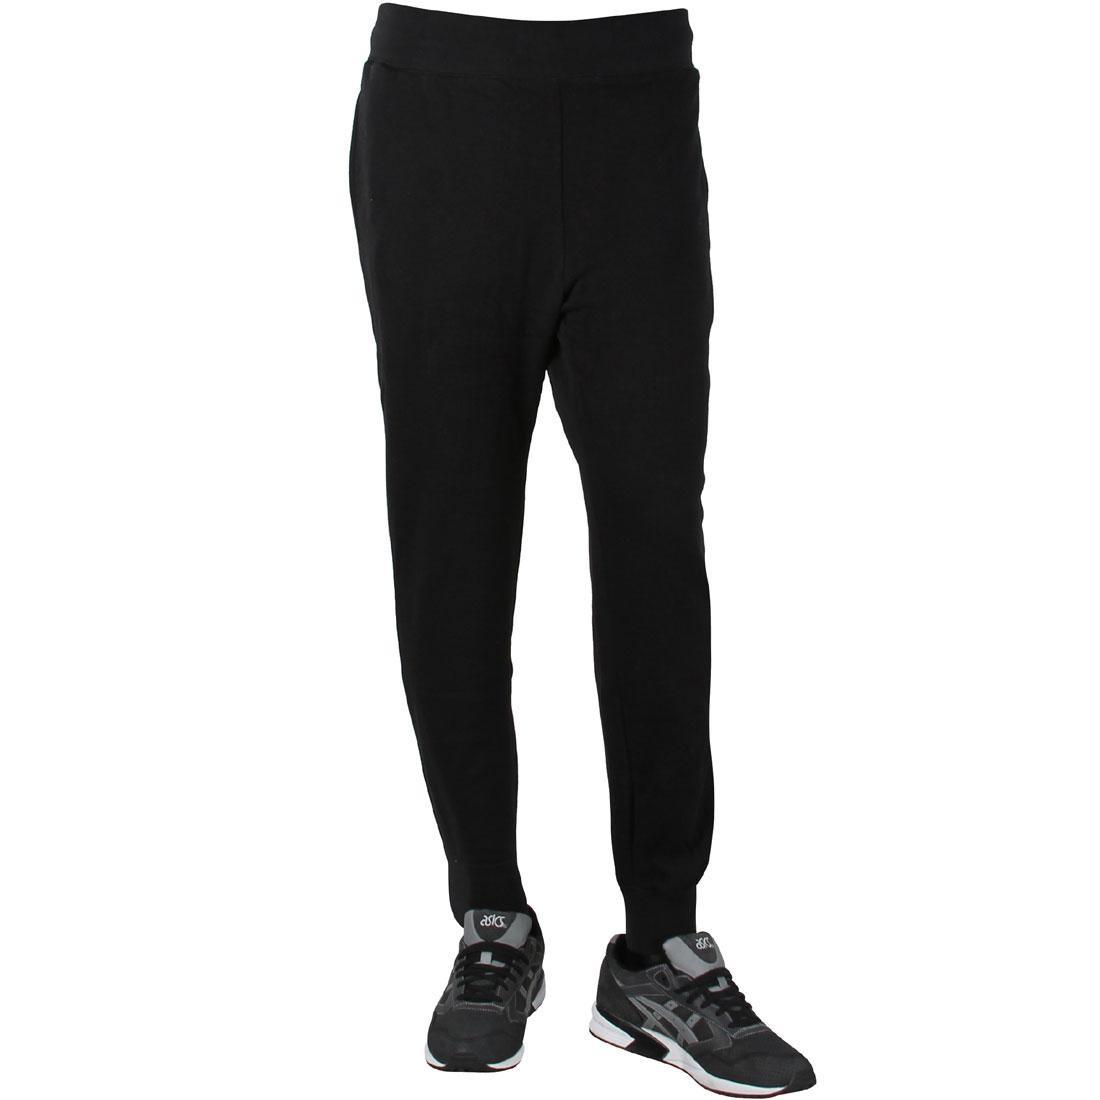 e35fc994 Stussy Men Tonal Stock Fleece Pants black